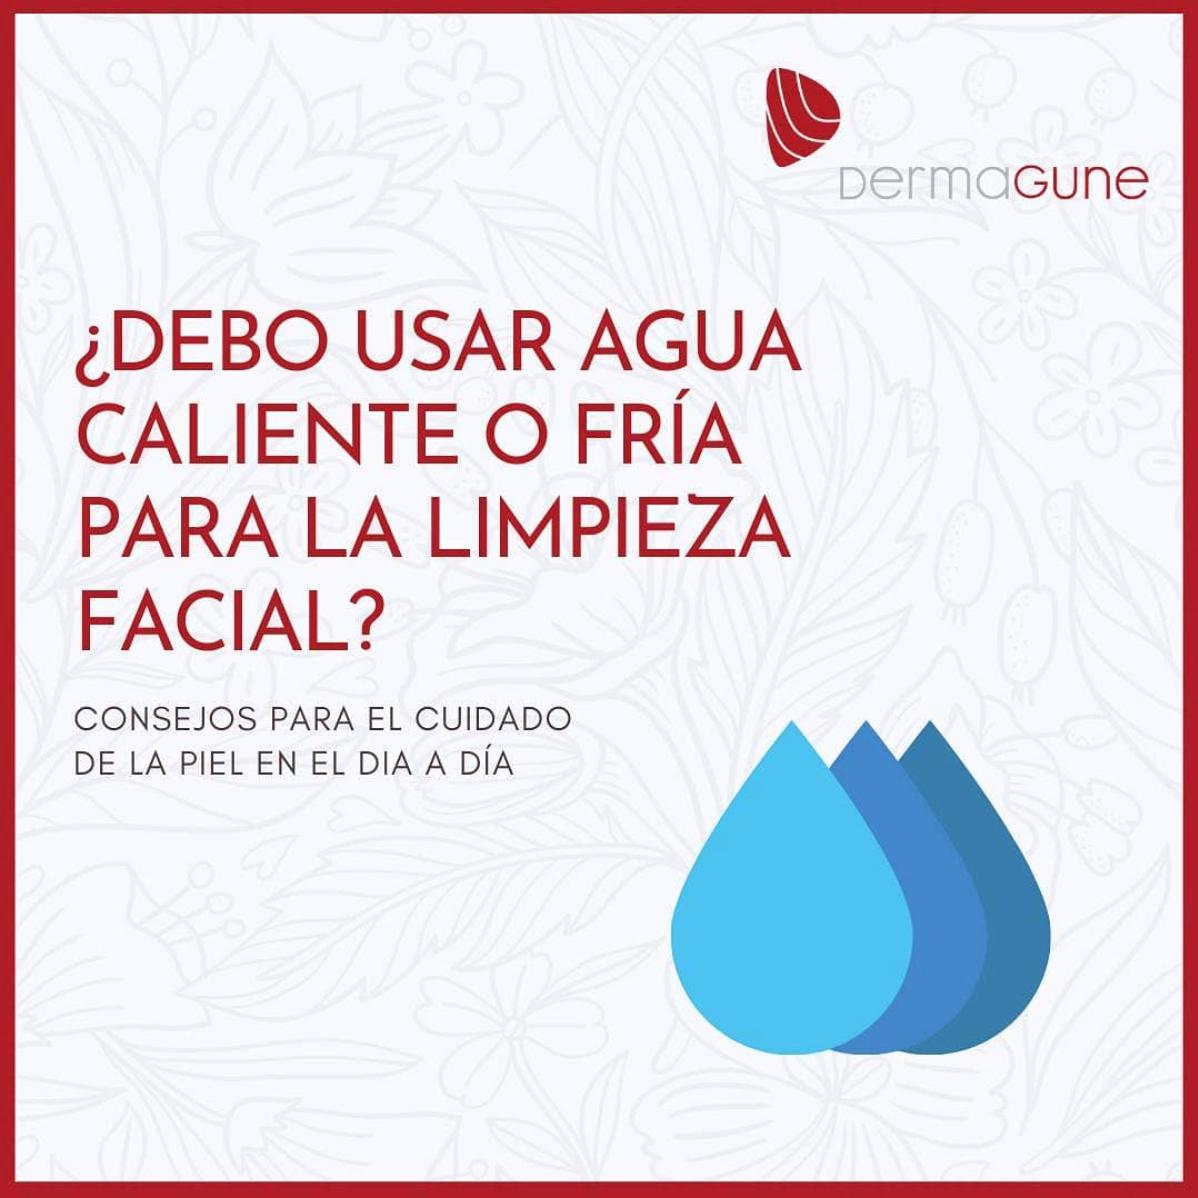 Agua-caliente-o-fria-para-limpieza-facial.png